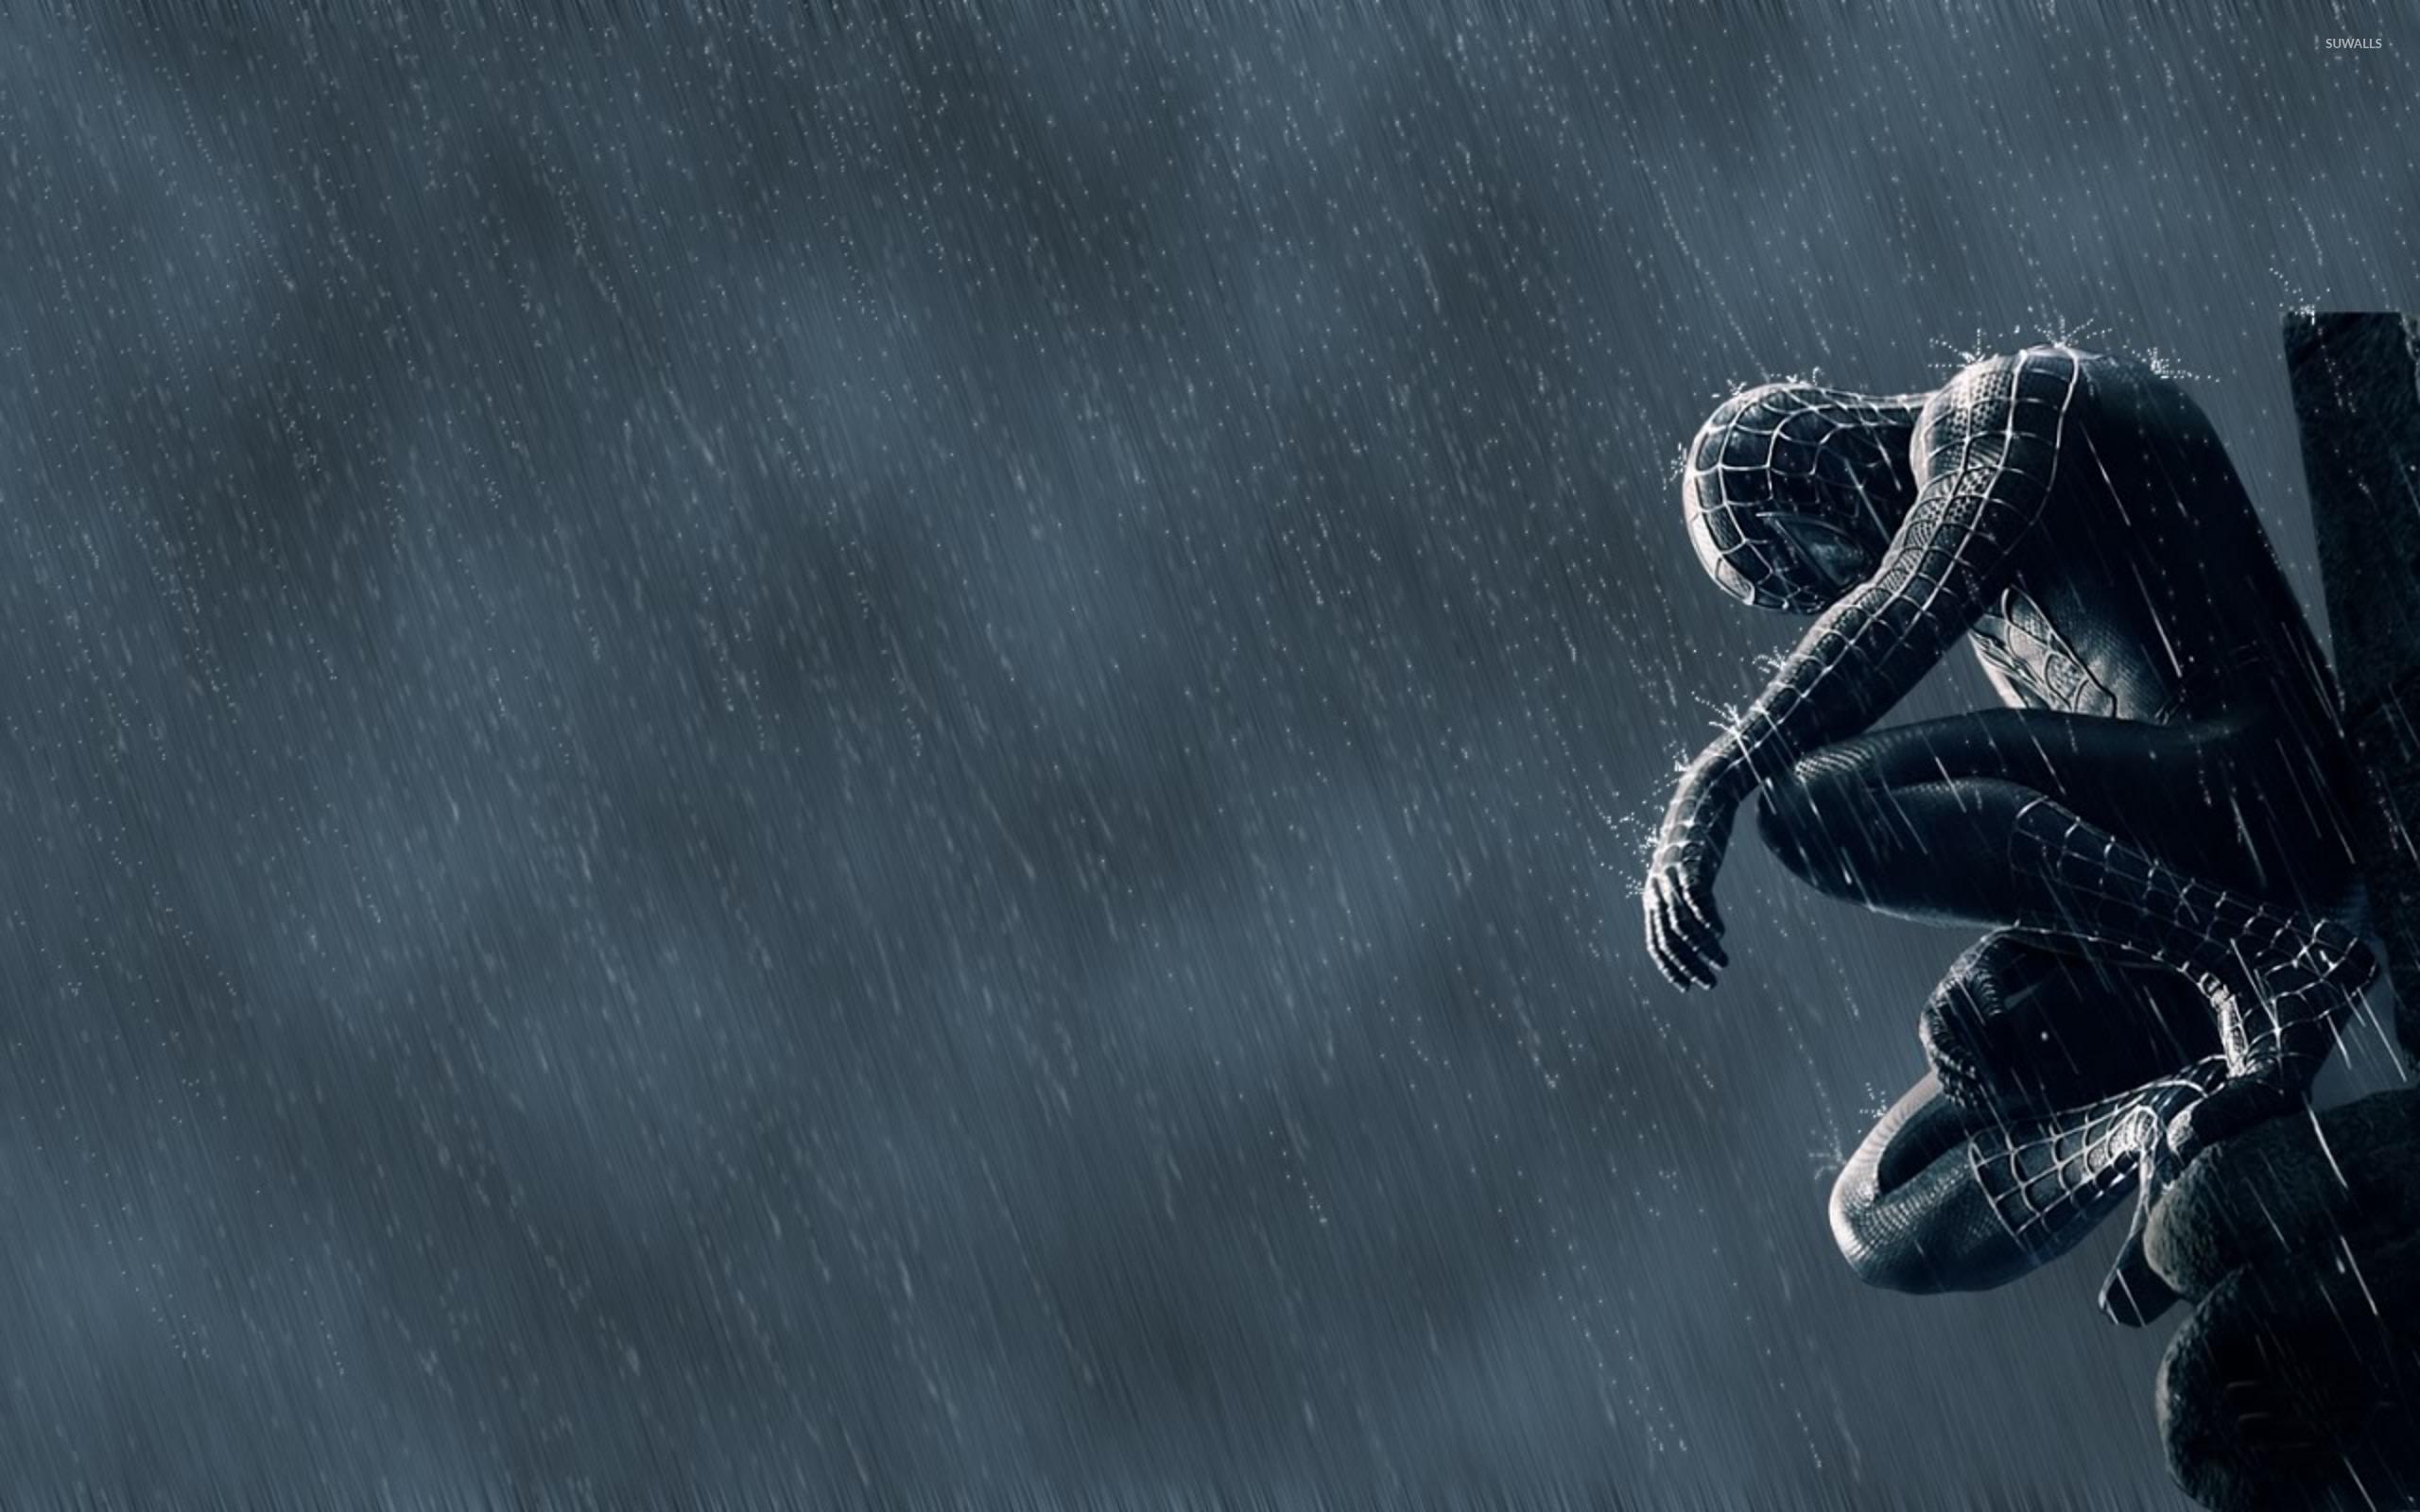 Spider Man 3 2 Wallpaper Movie Wallpapers 43091